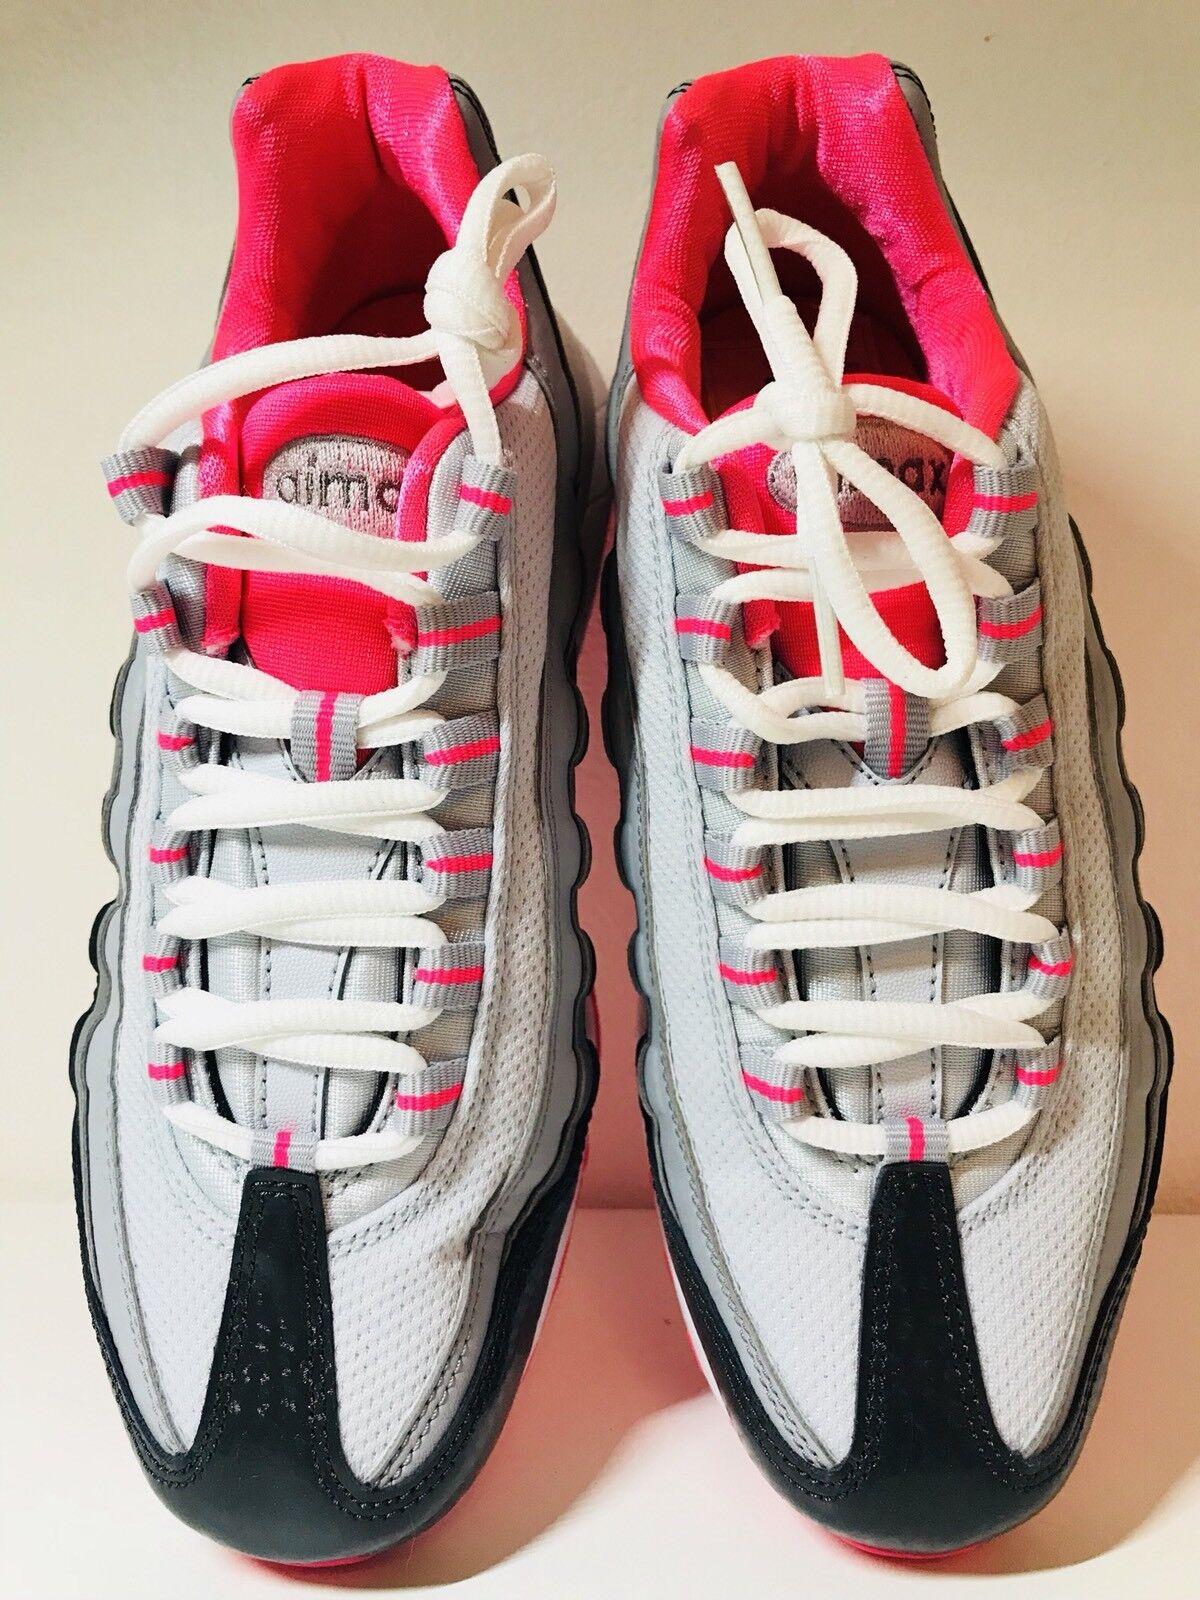 Nike Air Max 95 Größe 38 ORIGINAL NEU Turnschuhe  Weiß Grau Pink